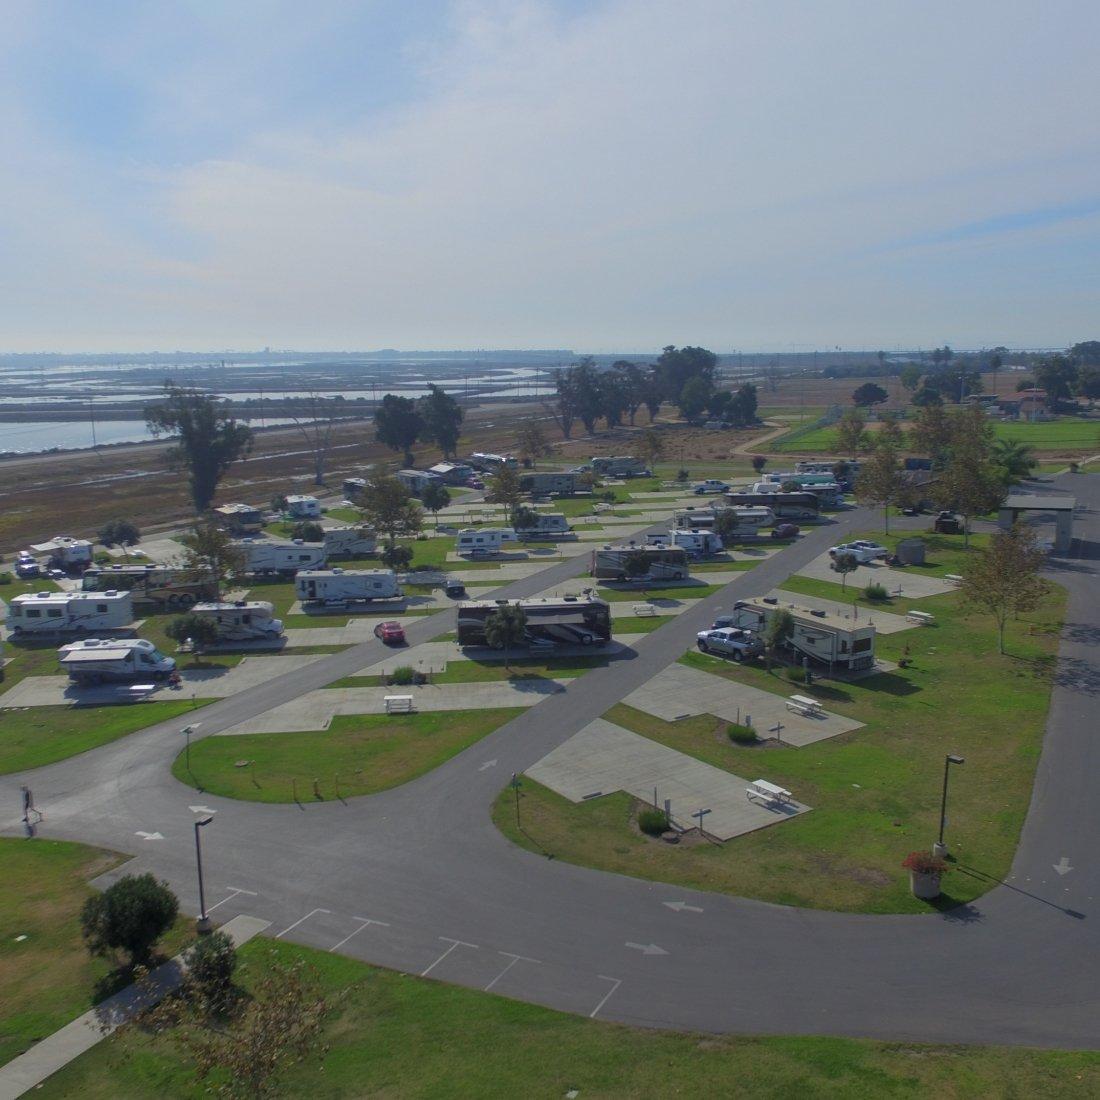 aerial view of Seabreeze RV Resort